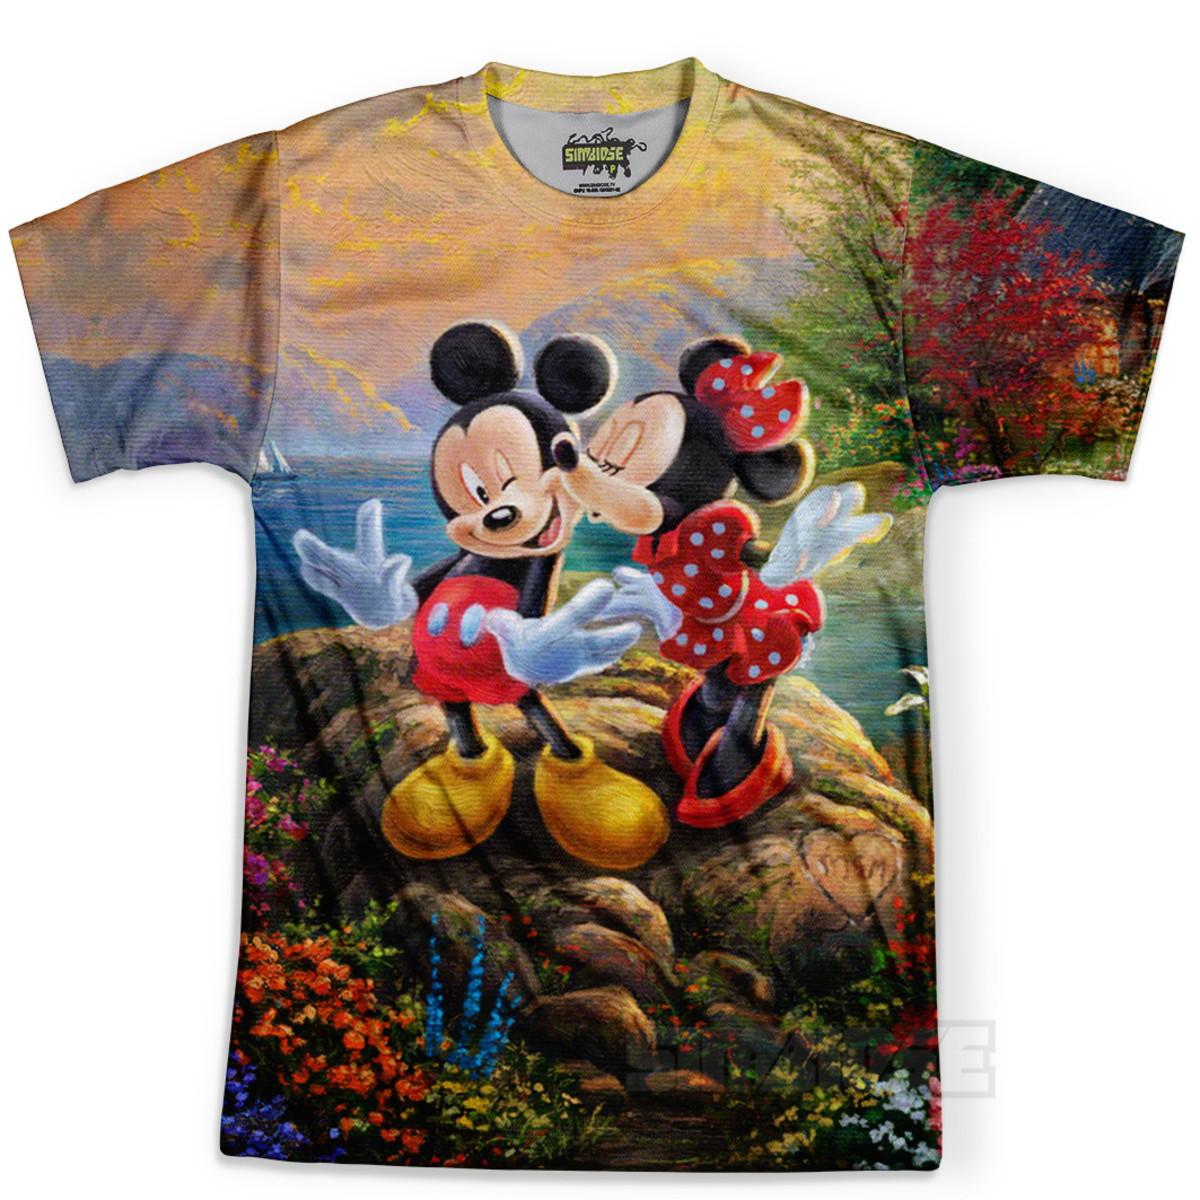 107f6305d7 Camiseta Masculina Mickey Mouse MD03 no Elo7